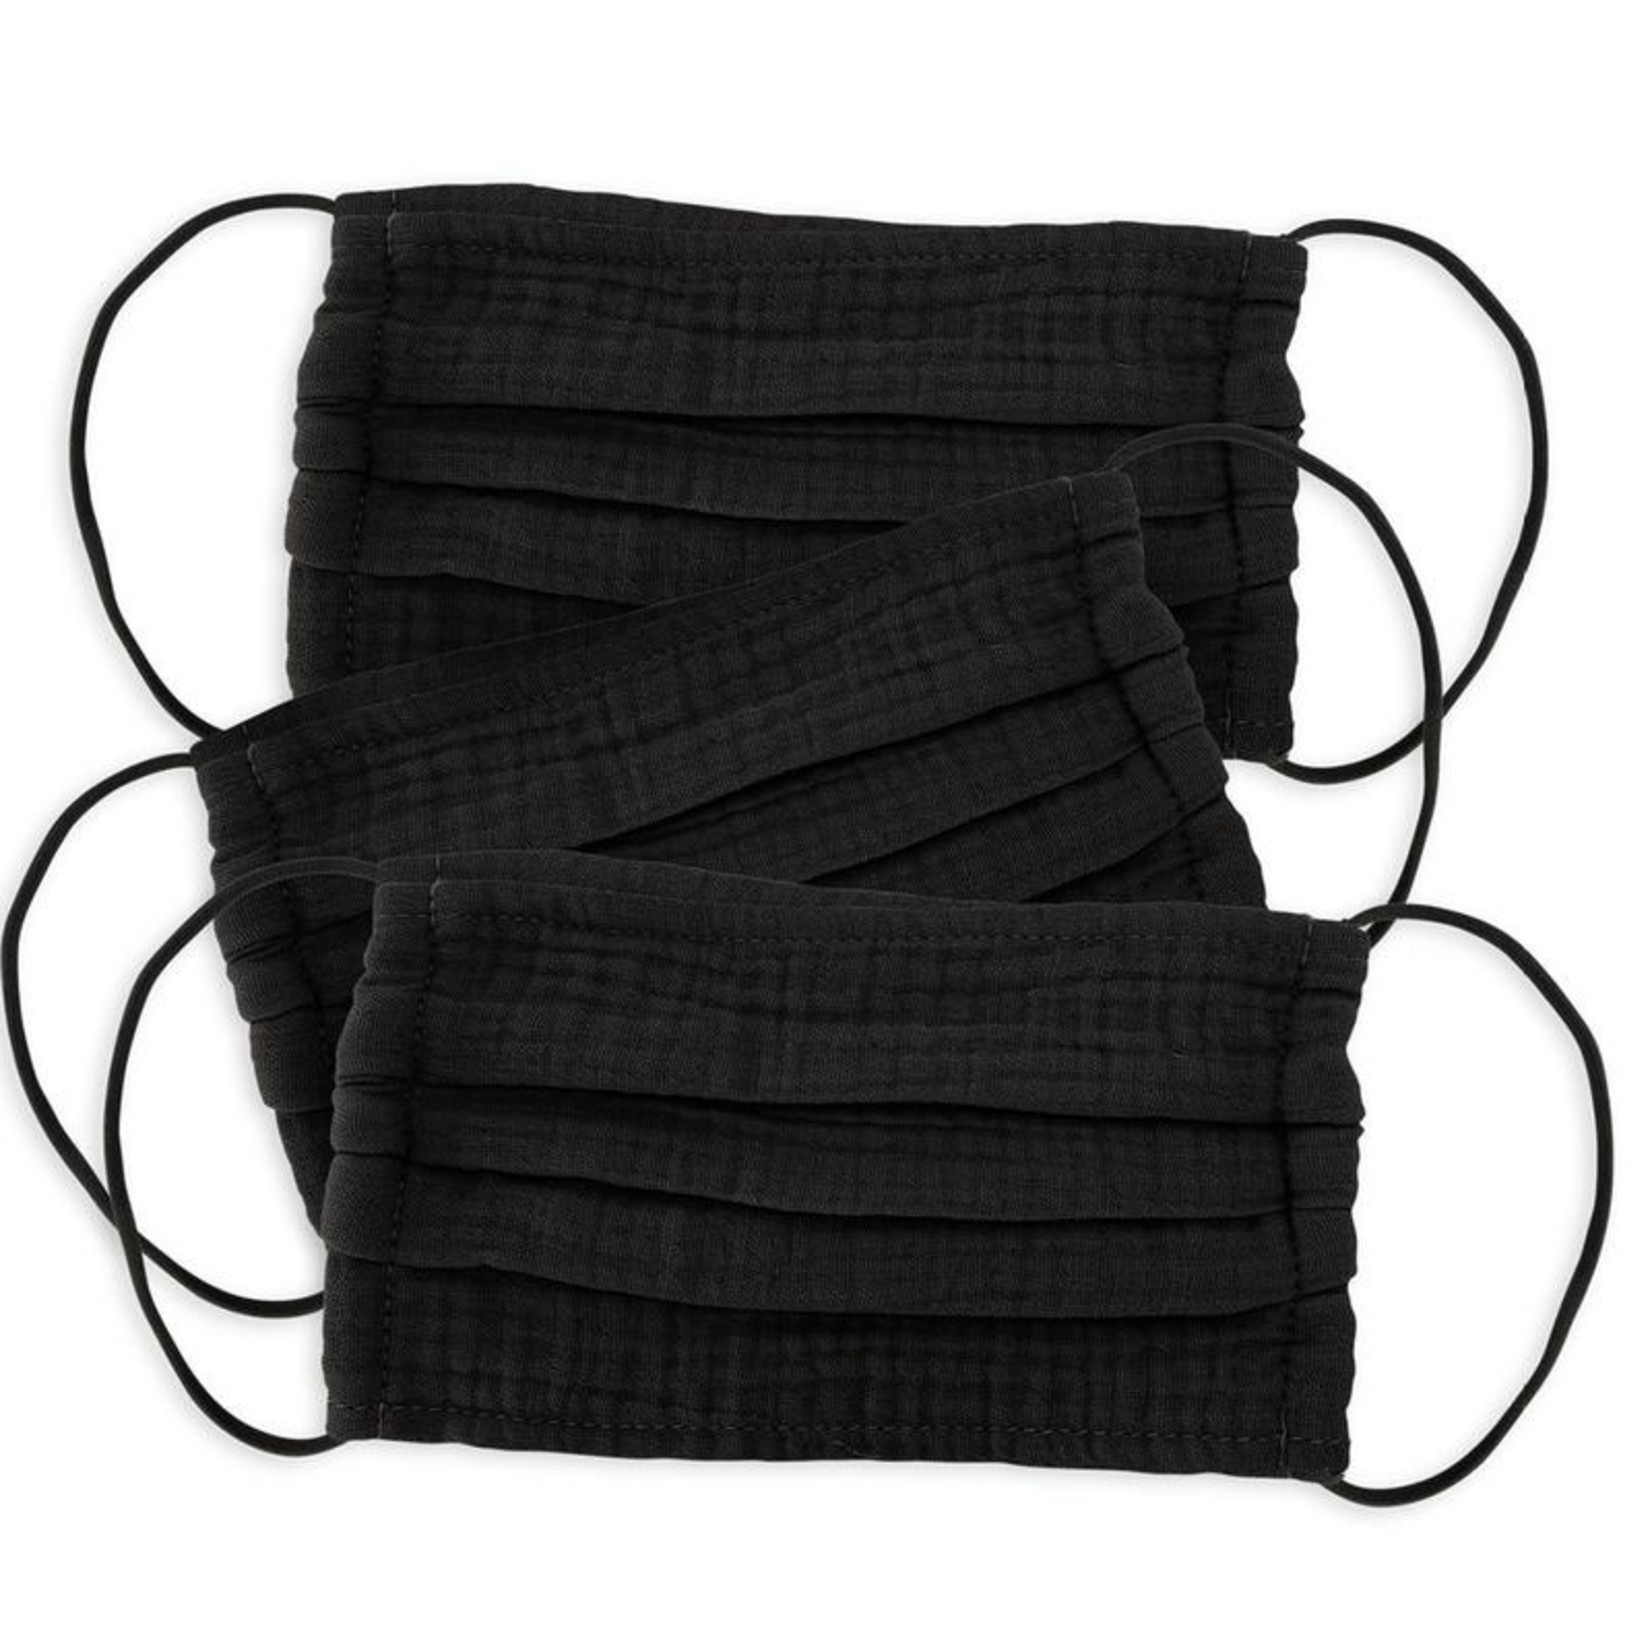 Kitsch 100% Cotton Face Mask 3 Piece Set- Black